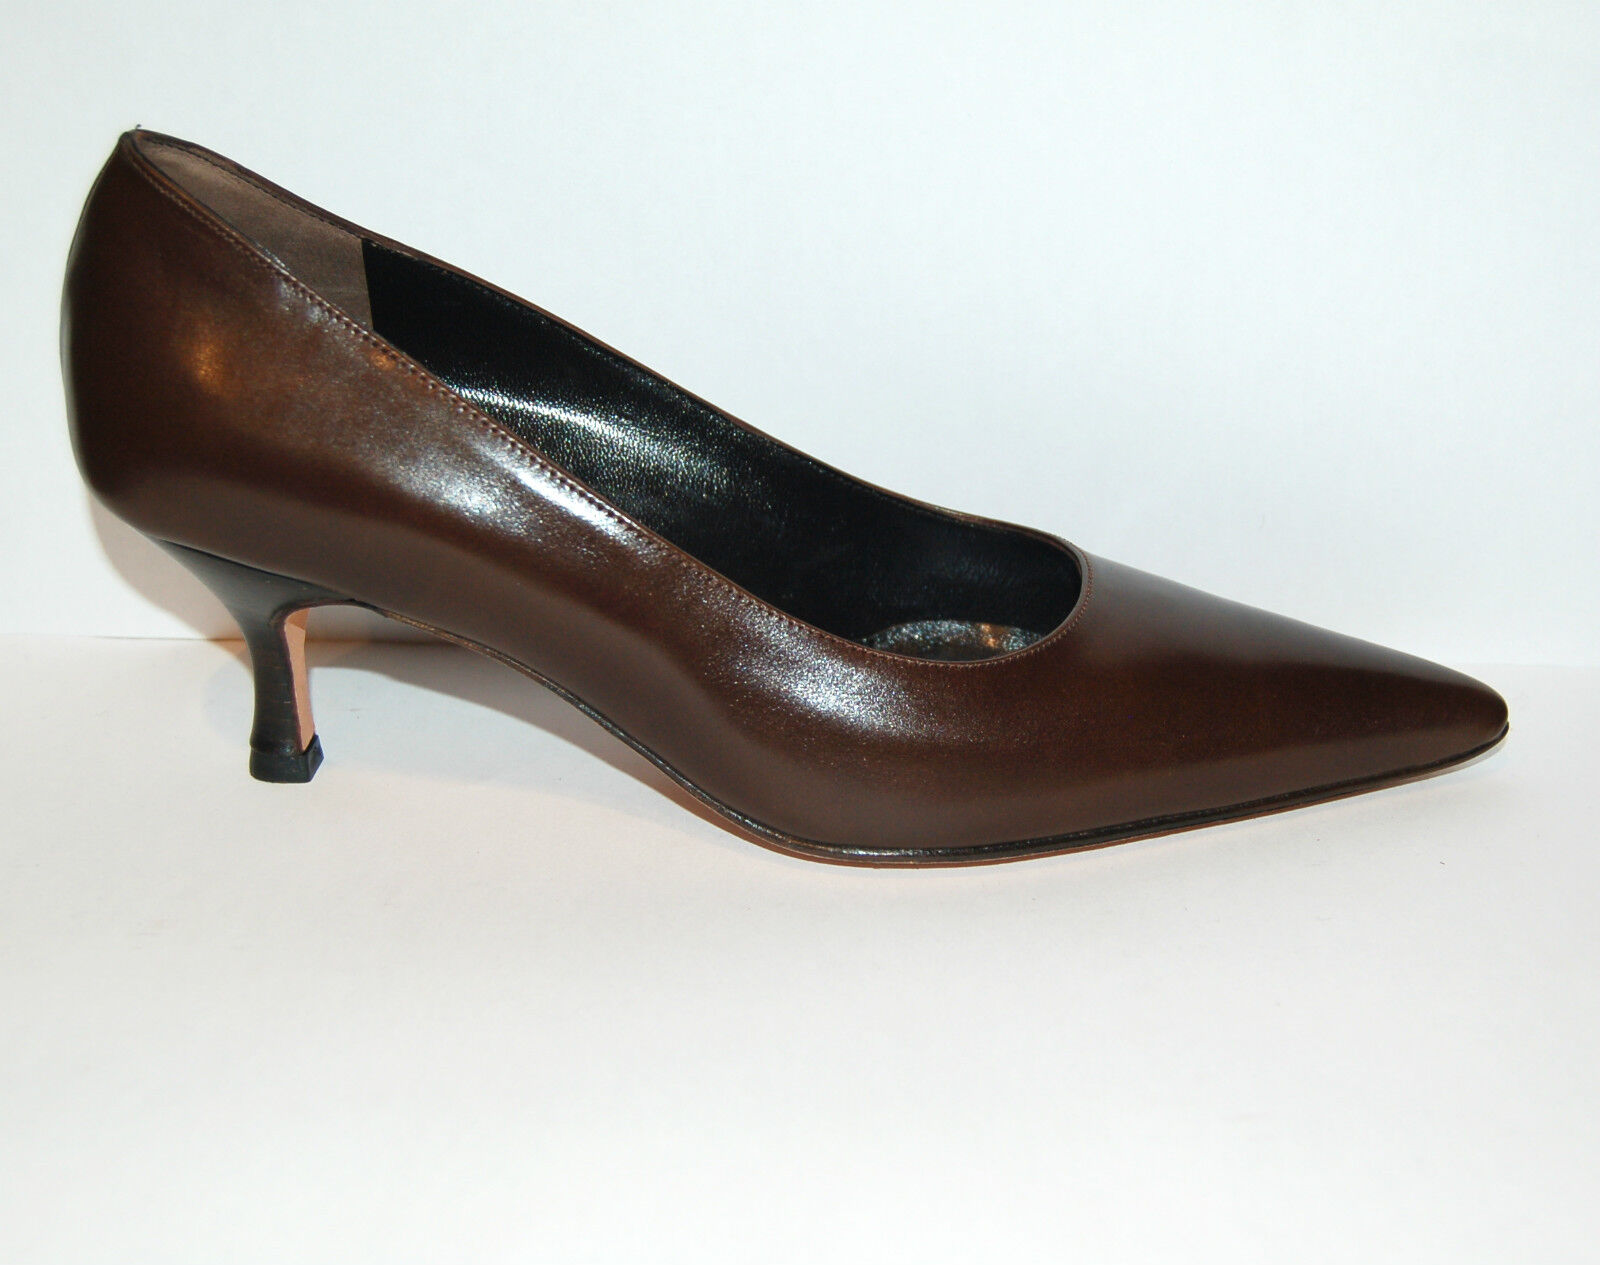 39eu - WOMAN POINTED PUMP - marron CALF - LEATHER SOLE - HEEL 5,5cm